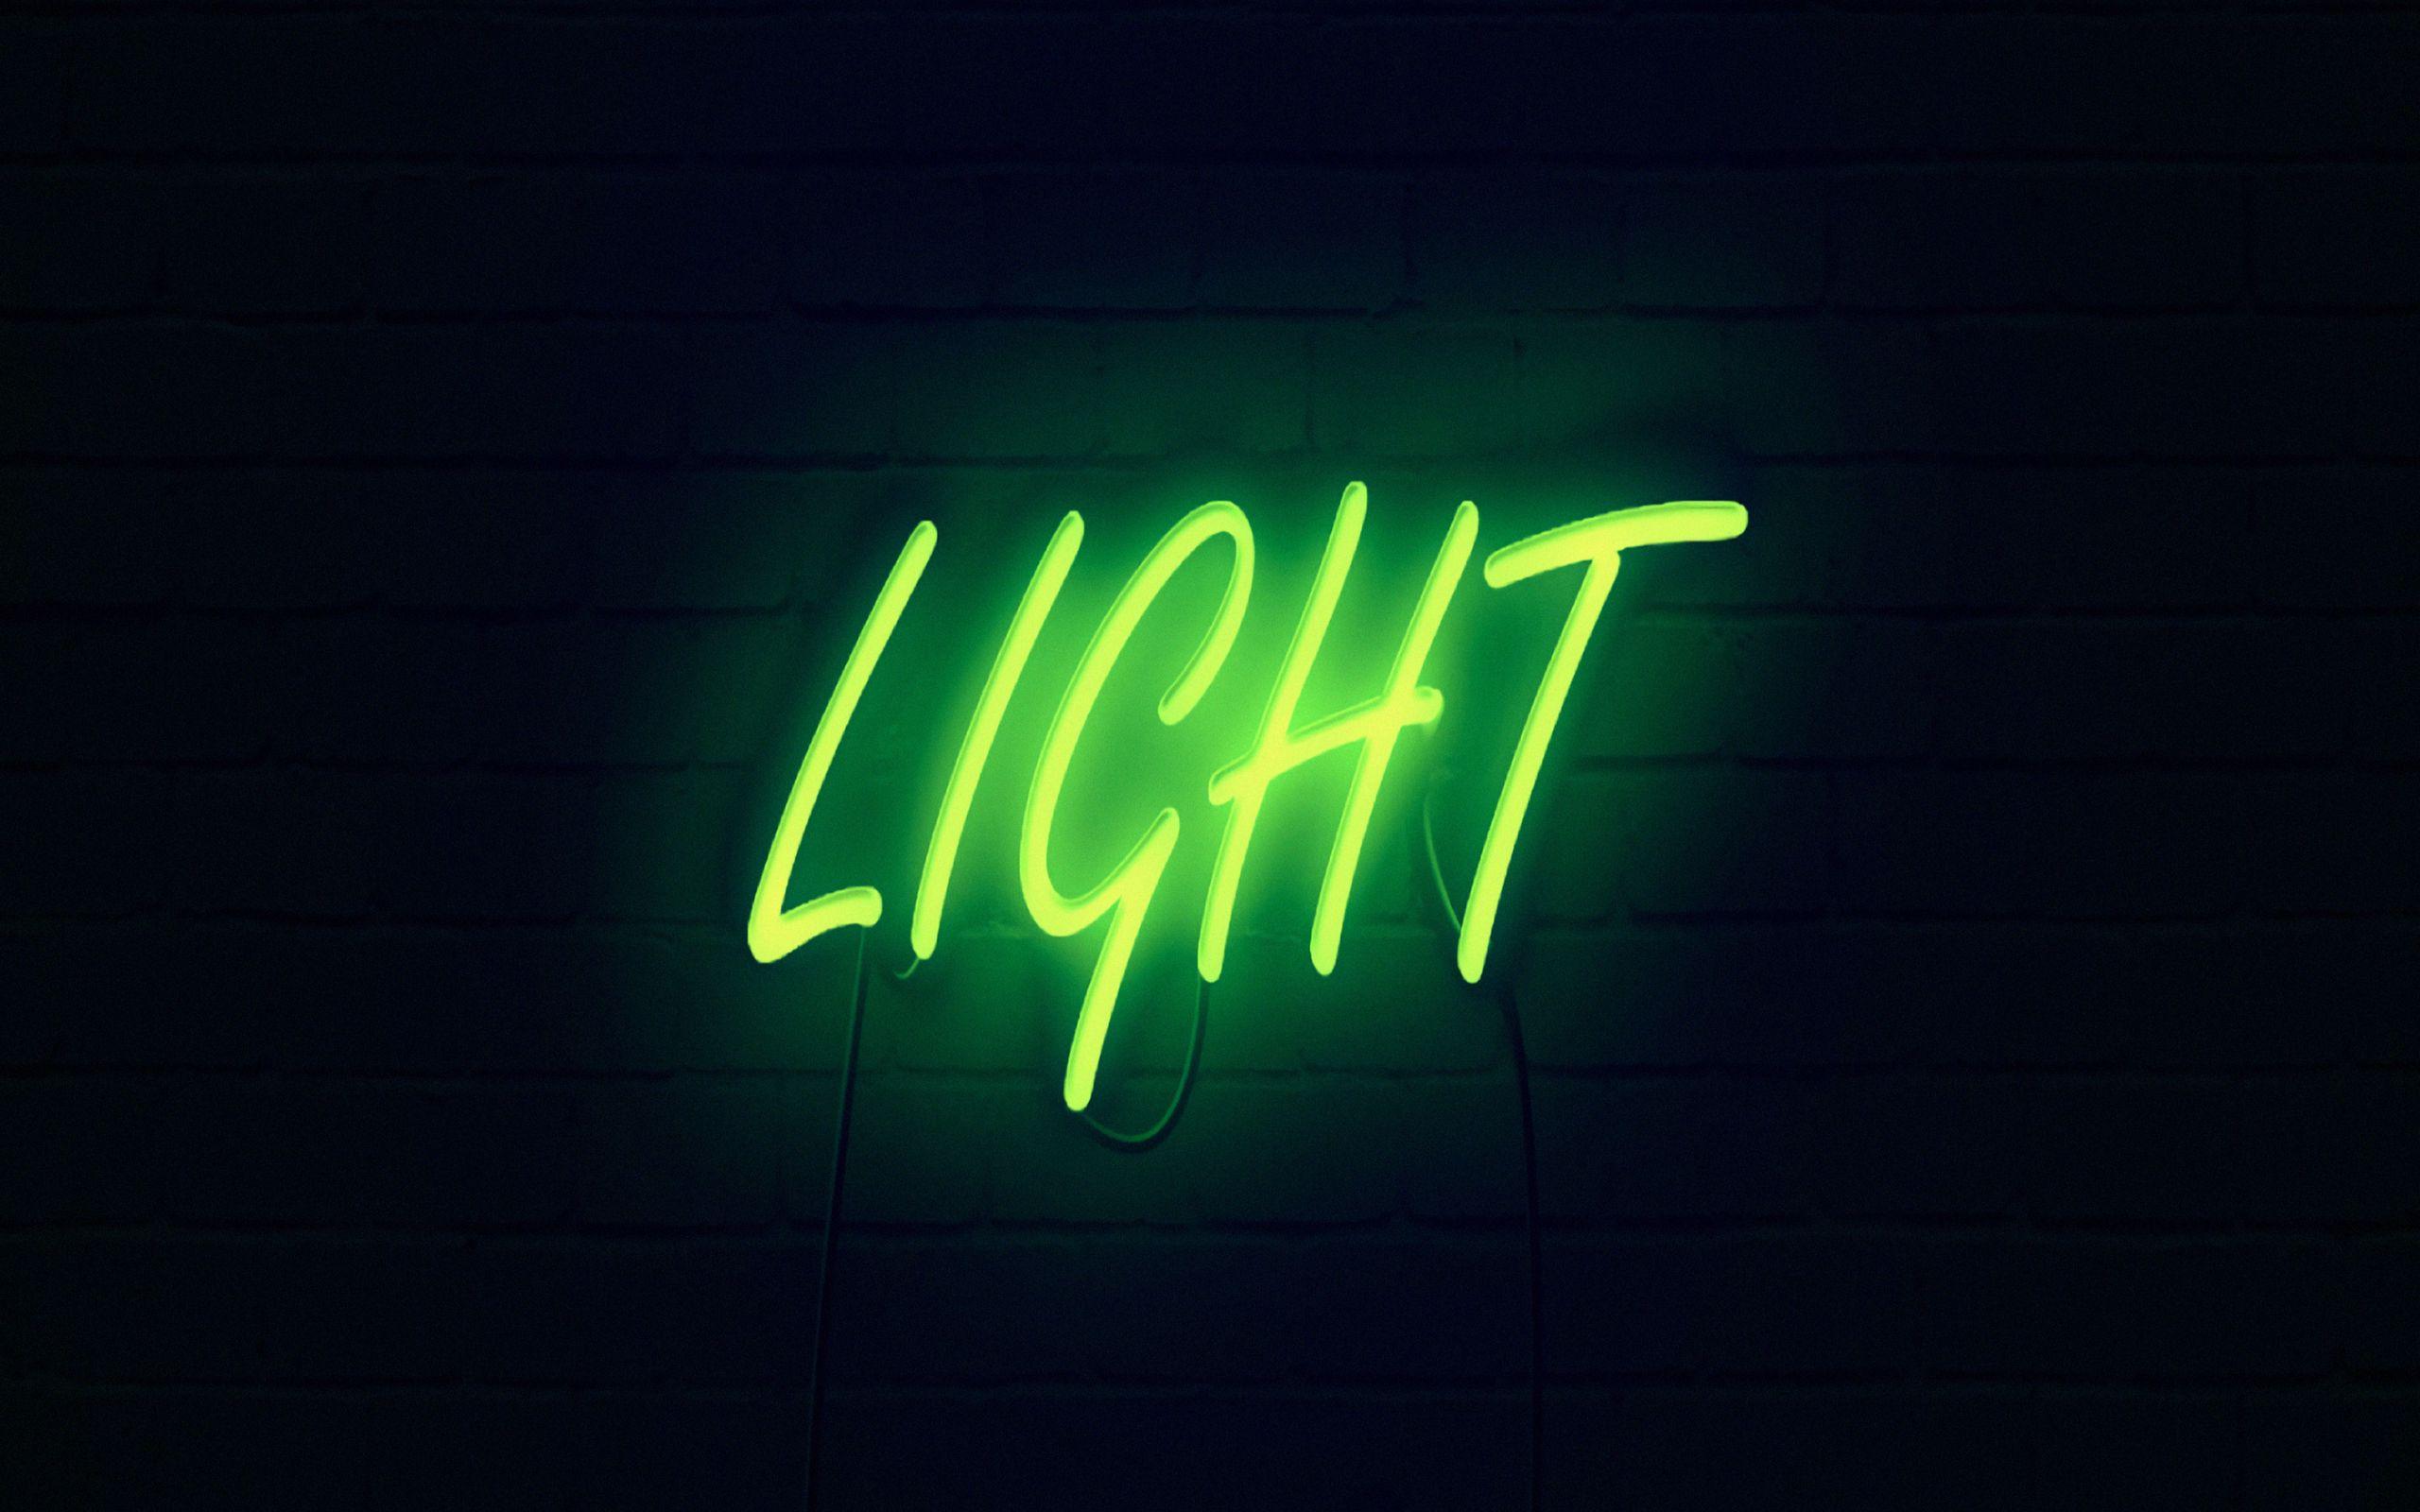 2560x1600 Wallpaper light, neon, inscription, dark, yellow